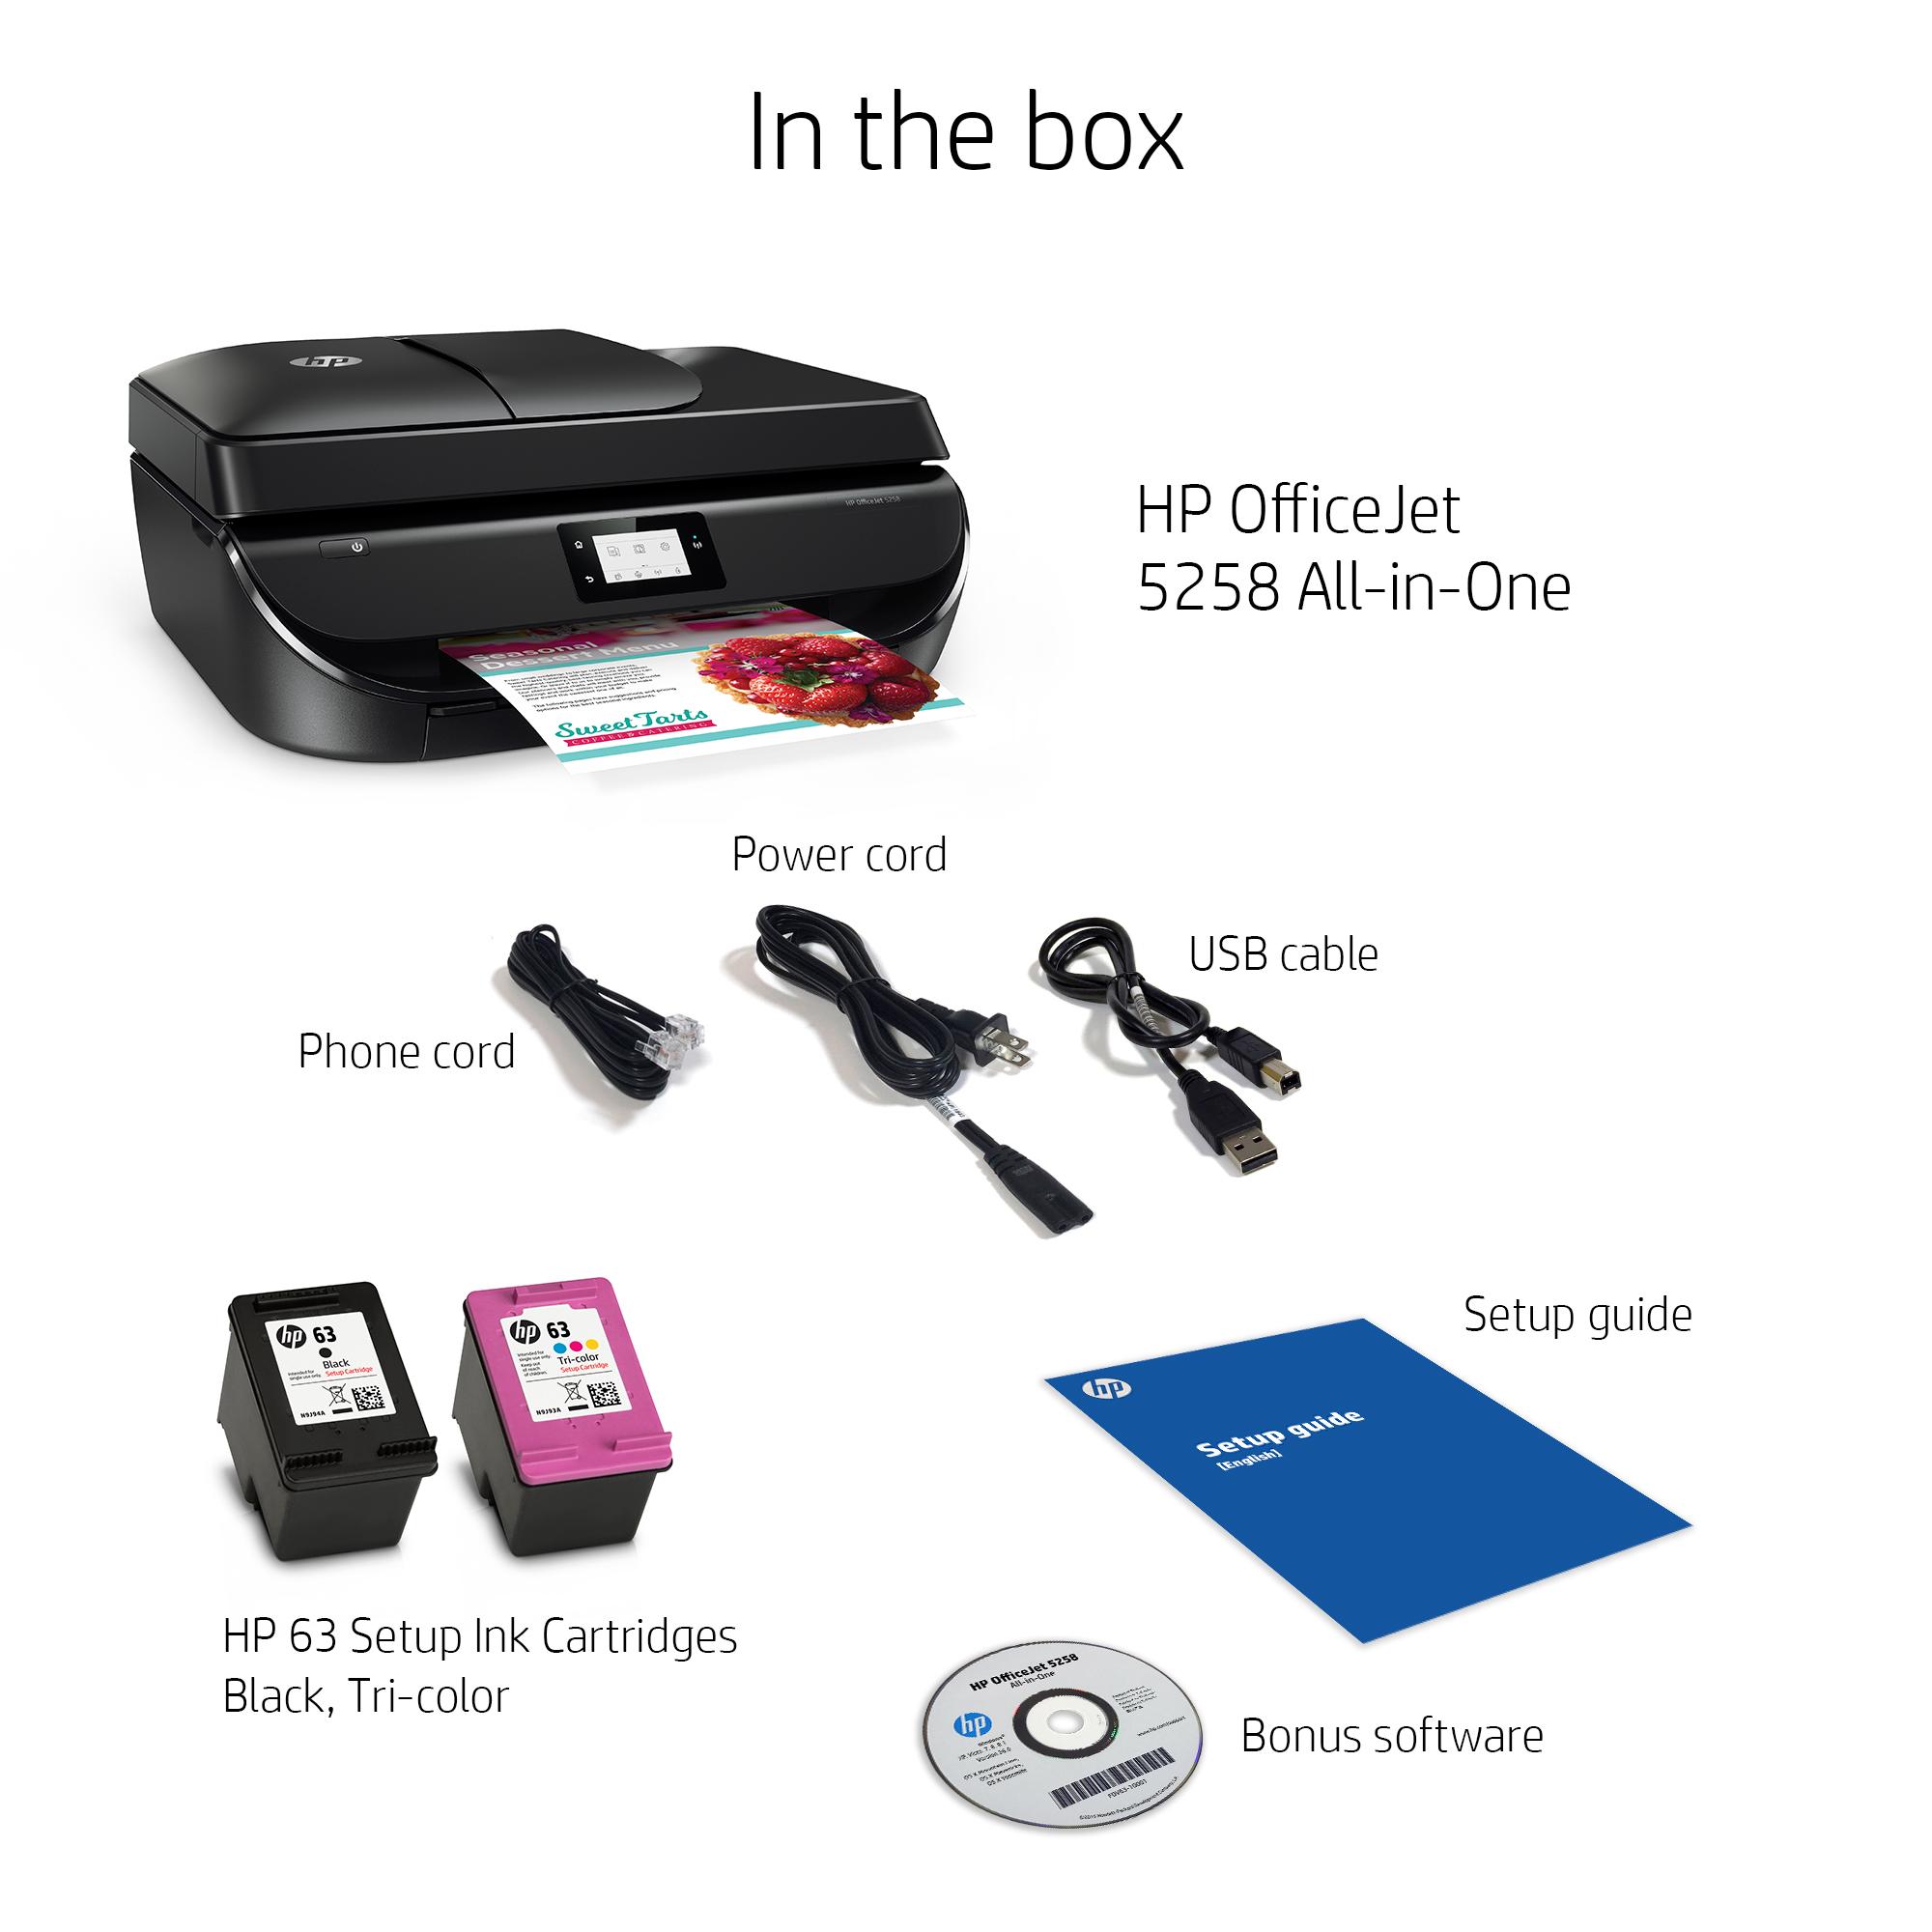 hp officejet 5258 operating manual